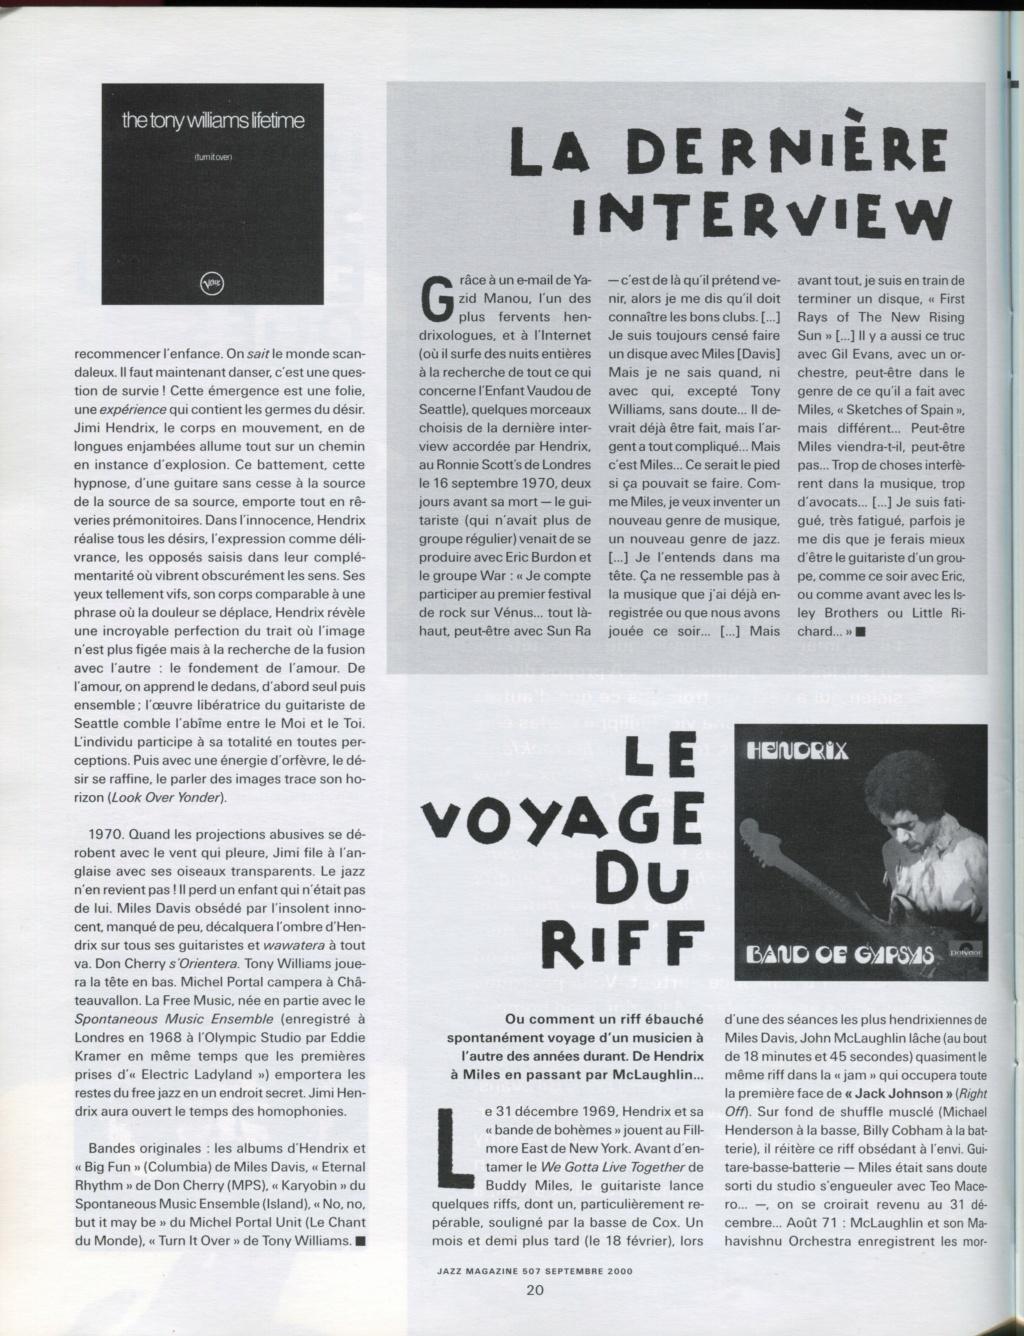 Magazines Français 1989 - 2014 - Page 2 1990_137